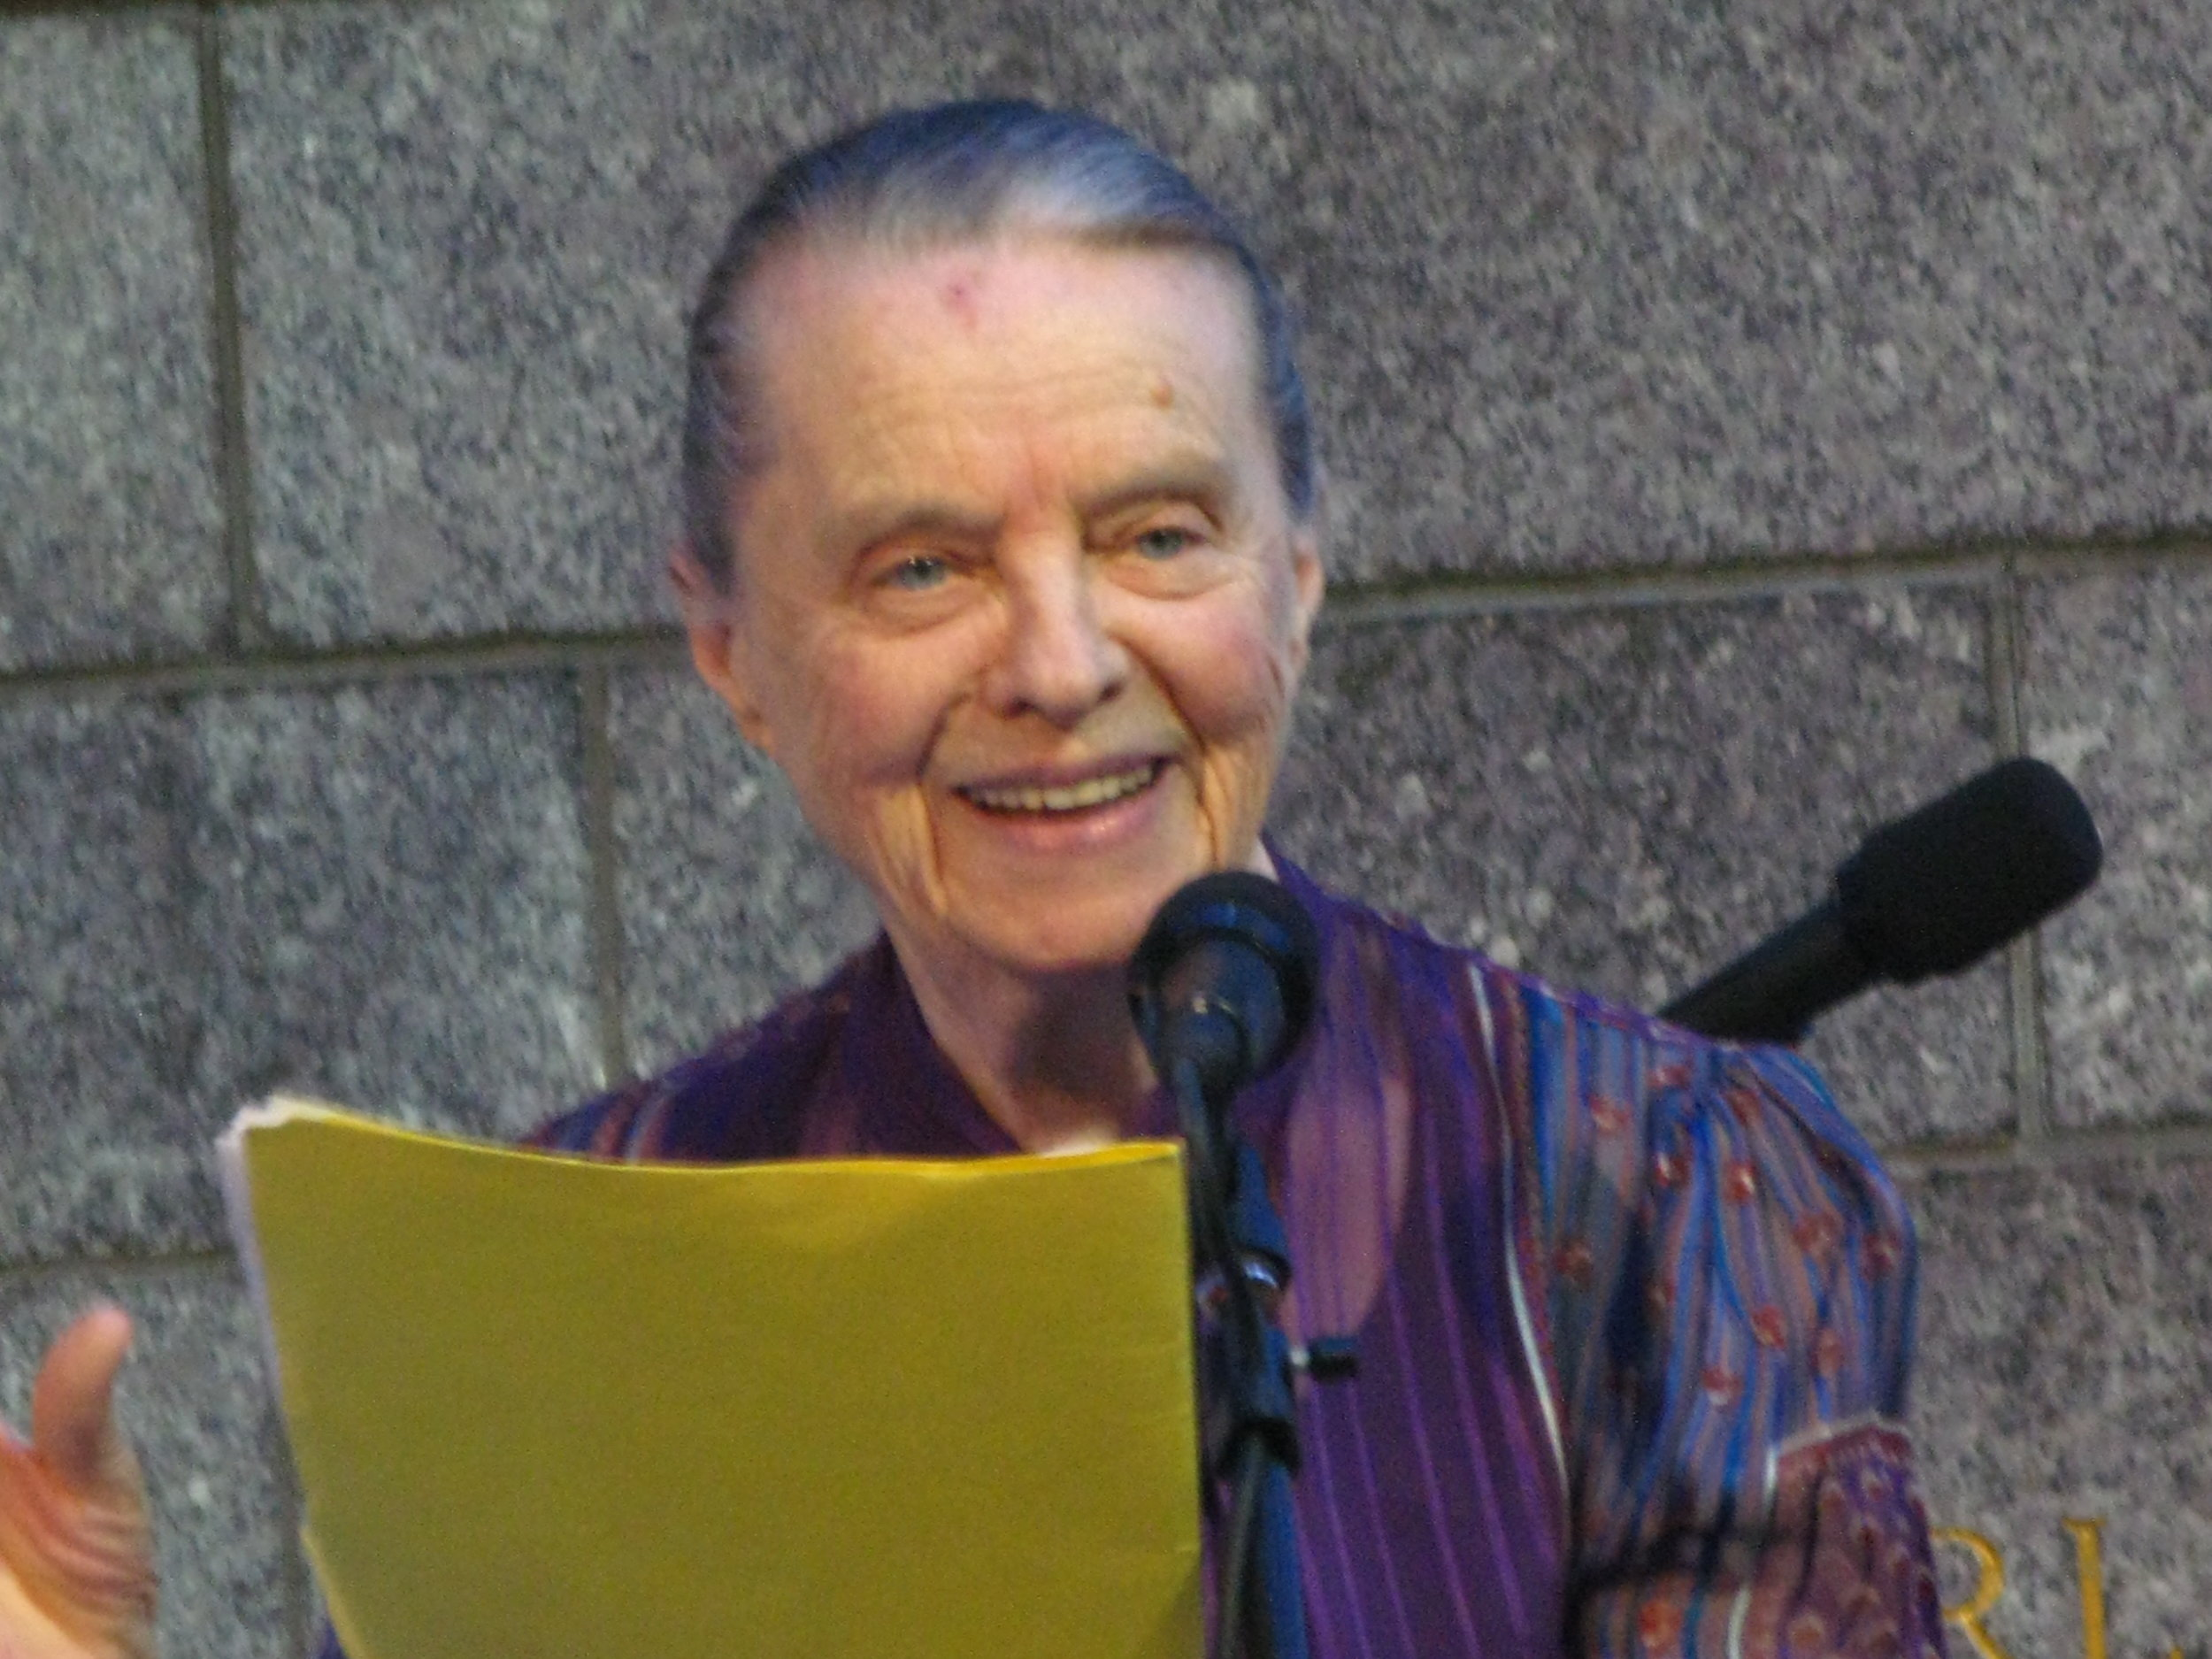 Marie Ponsot in Bryant Park, NYC  April 6, 1921 — July 5, 2019  photo courtesy of Josh Mizrahi